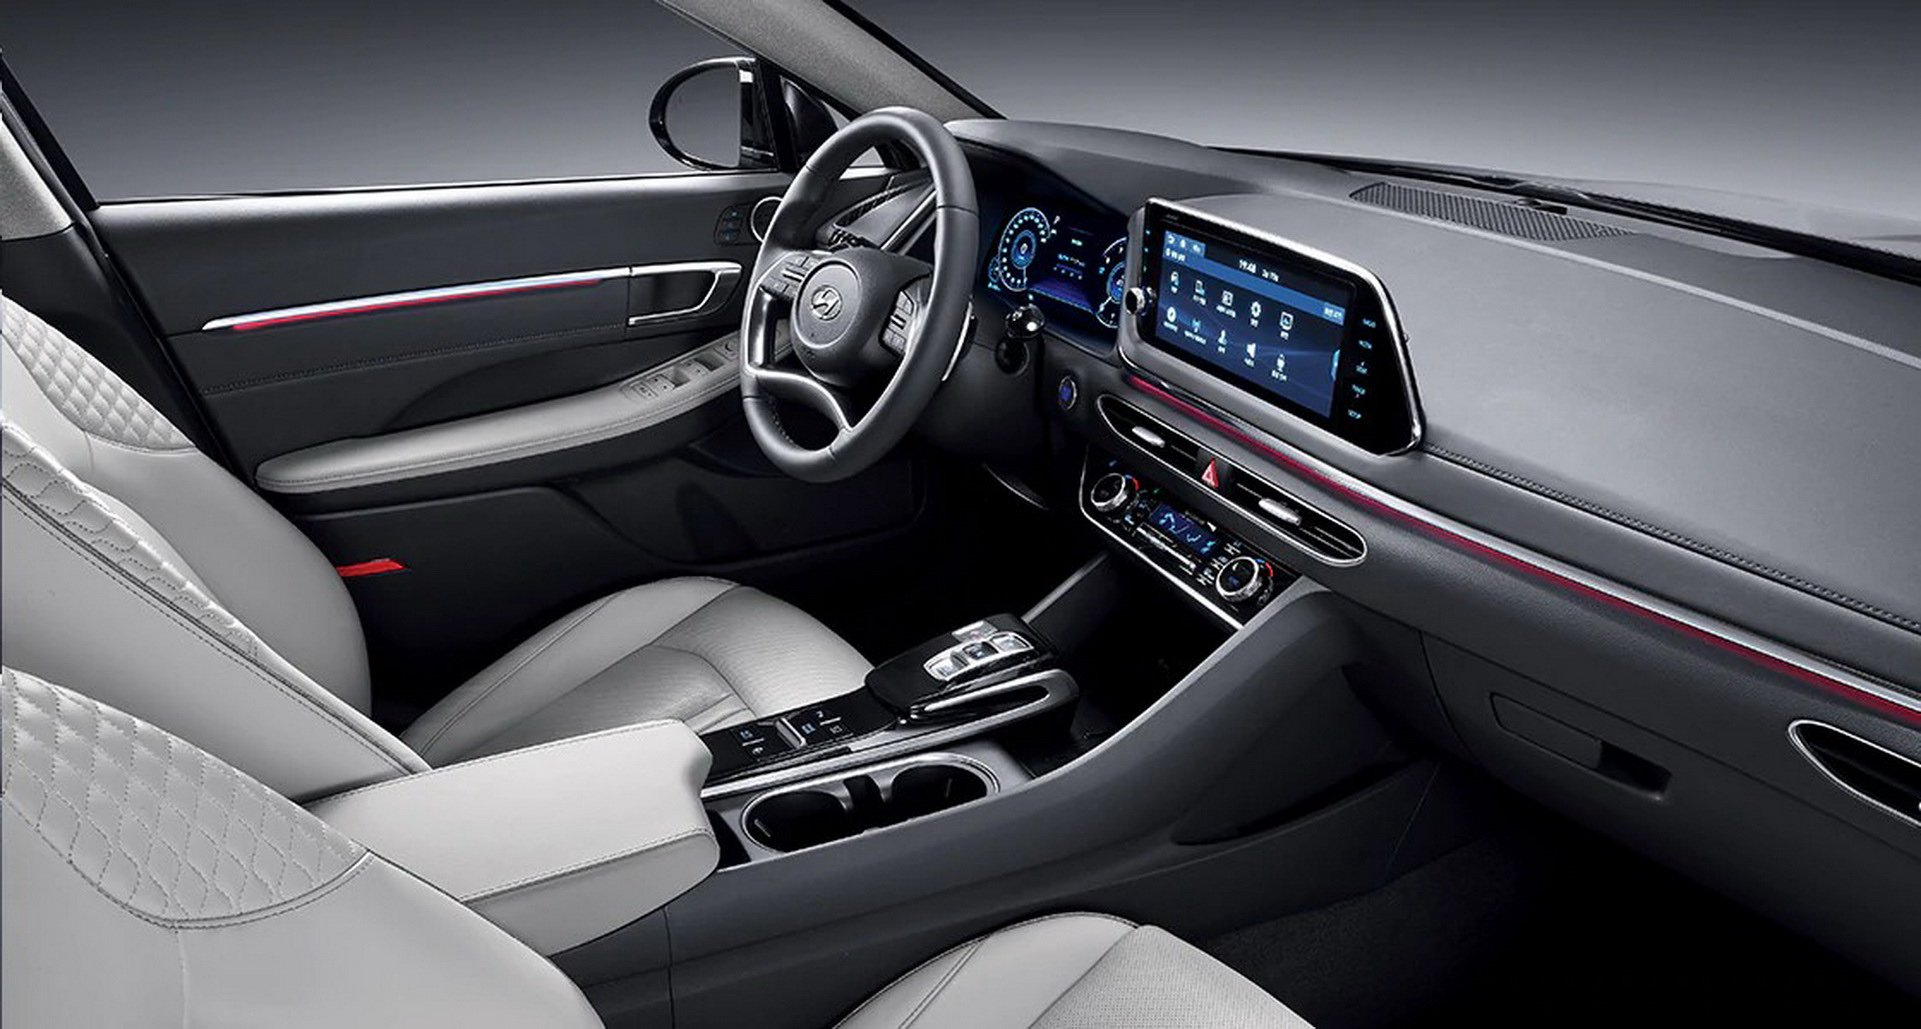 Hyundai Sonata Parts >> 2020 Hyundai Sonata 1.6 Turbo Coming To Seoul Motor Show - autoevolution